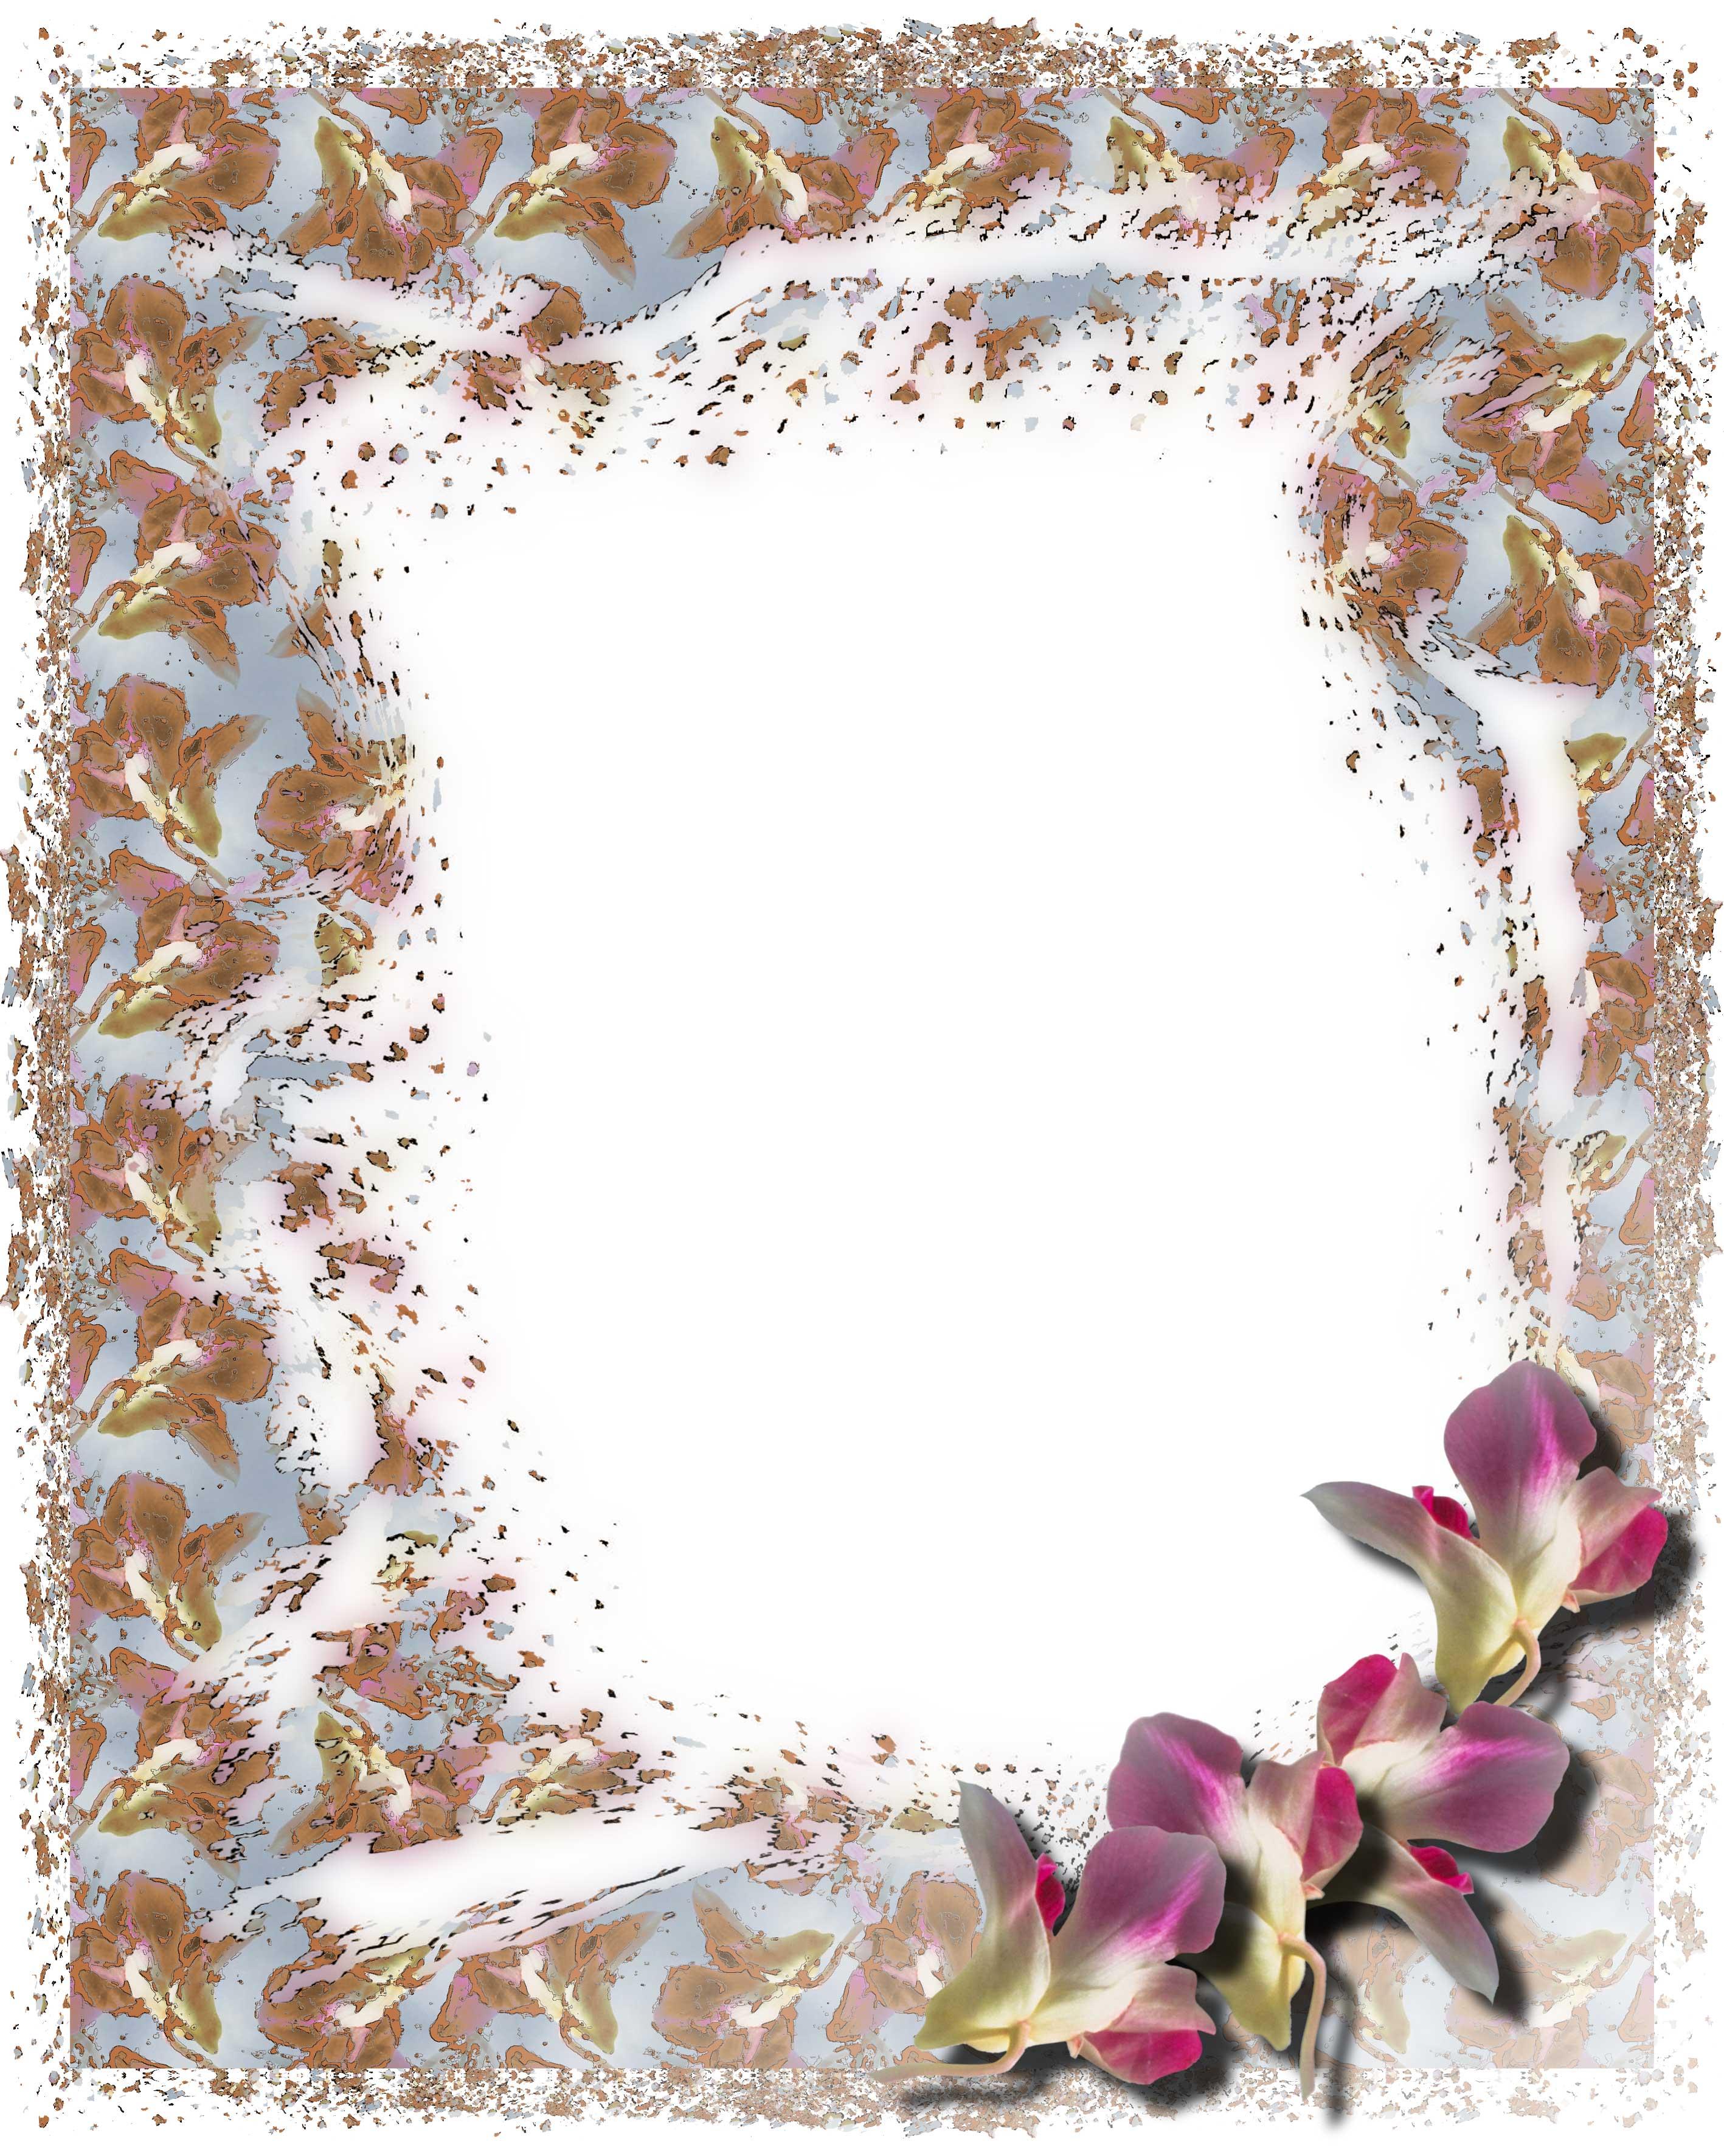 Декоративная рамка с цветком » LibFoto.ru ...: libfoto.ru/frame/otherframe/97-dekorativnaya-ramka-s-cvetkom.html